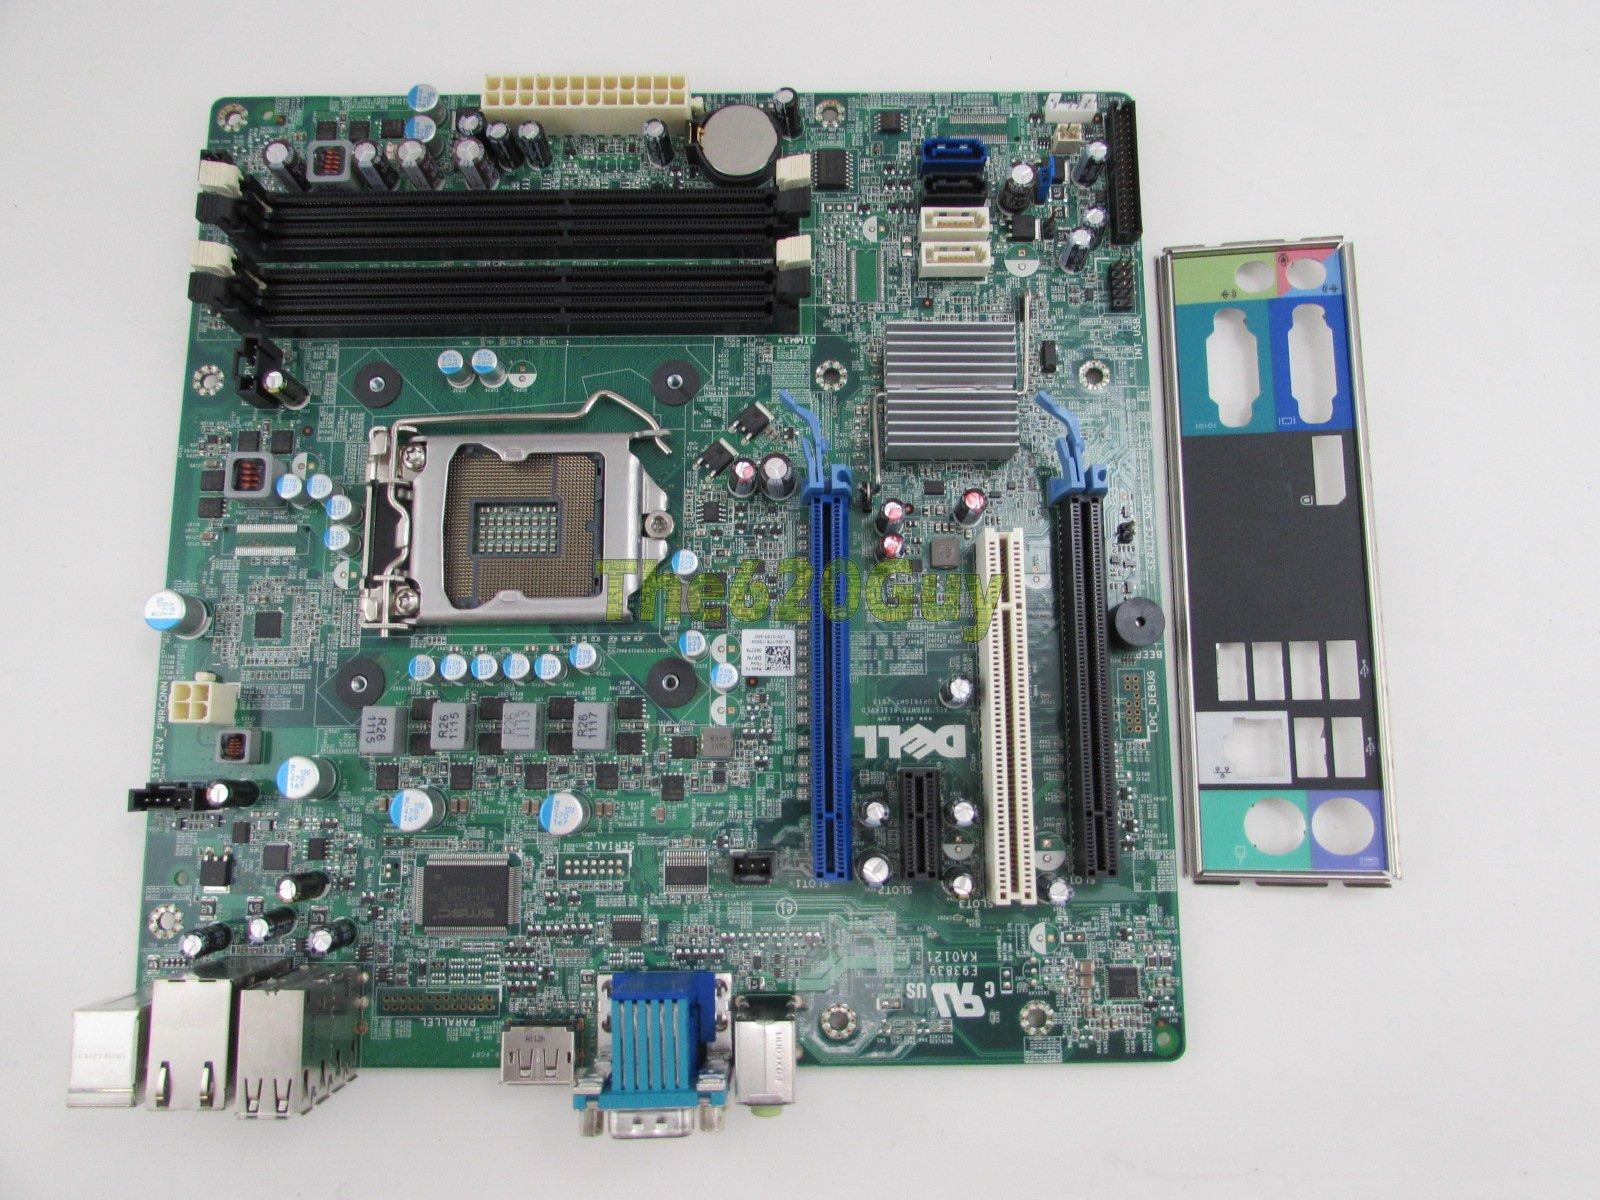 Dell OptiPlex 990 MT Motherboard 6D7TR Socket 1155 Q67 System Board + I/O  Plate - The620Guy com